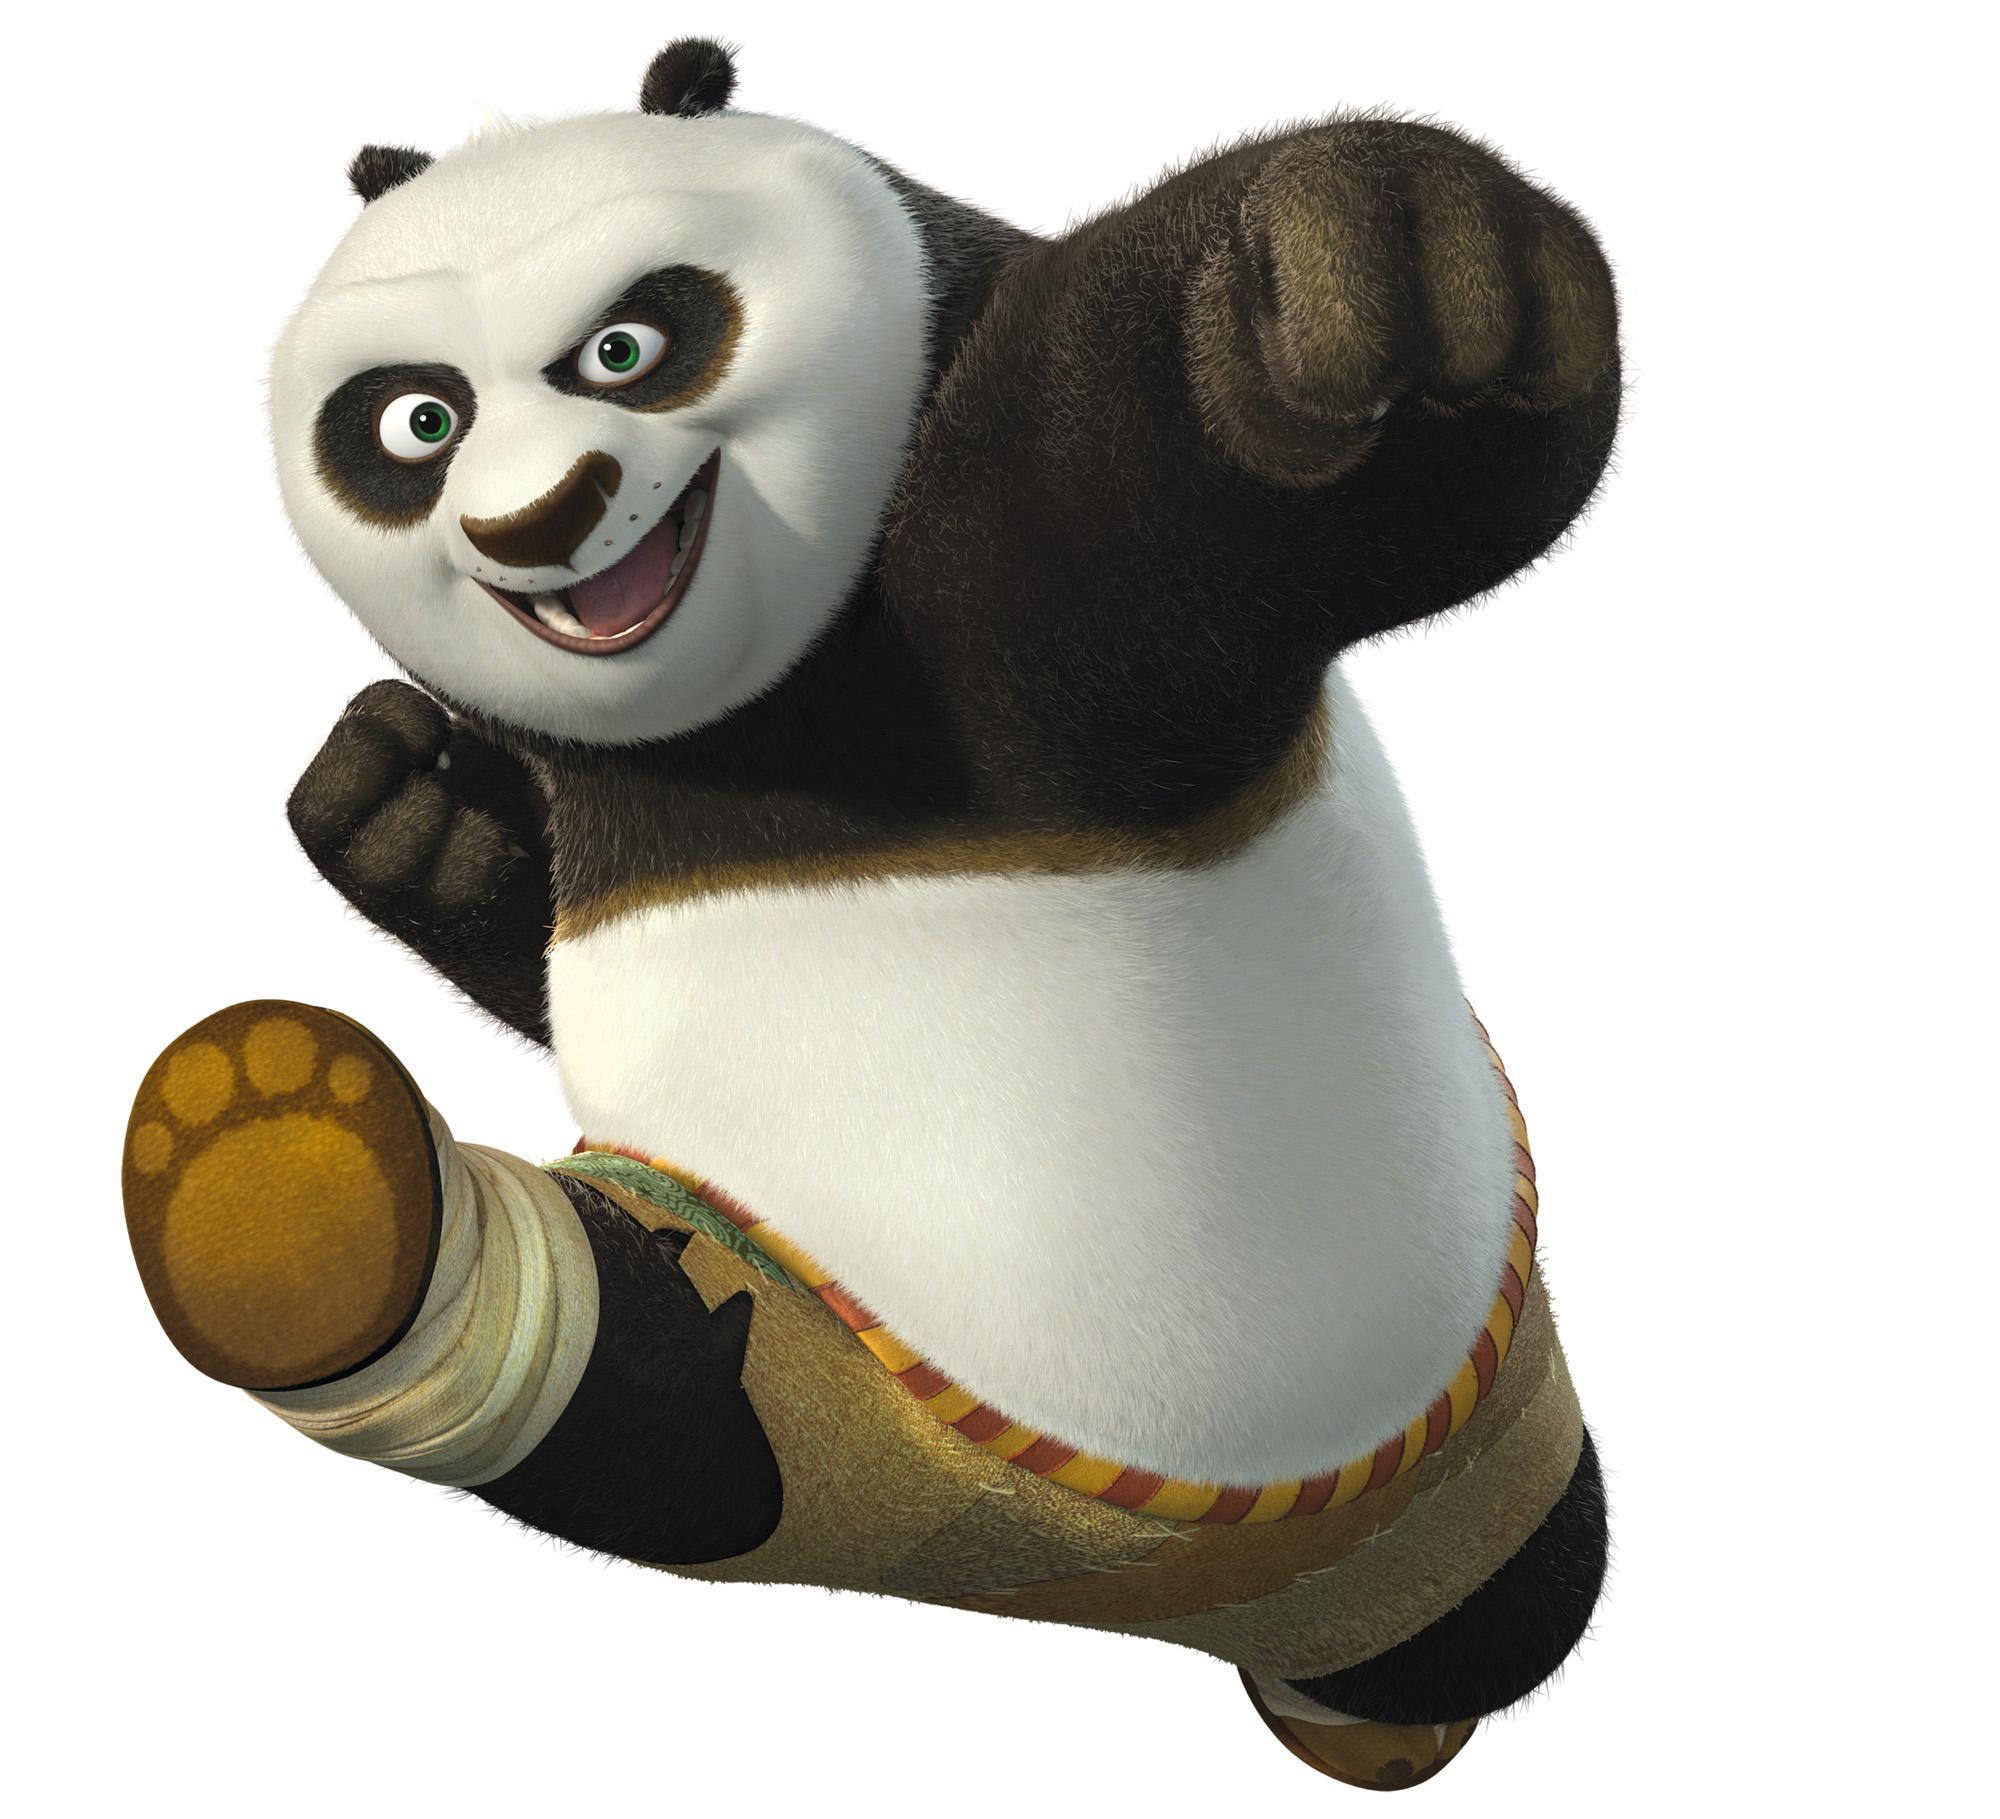 Coloriage po kung fu panda imprimer - Dessin kung fu panda ...